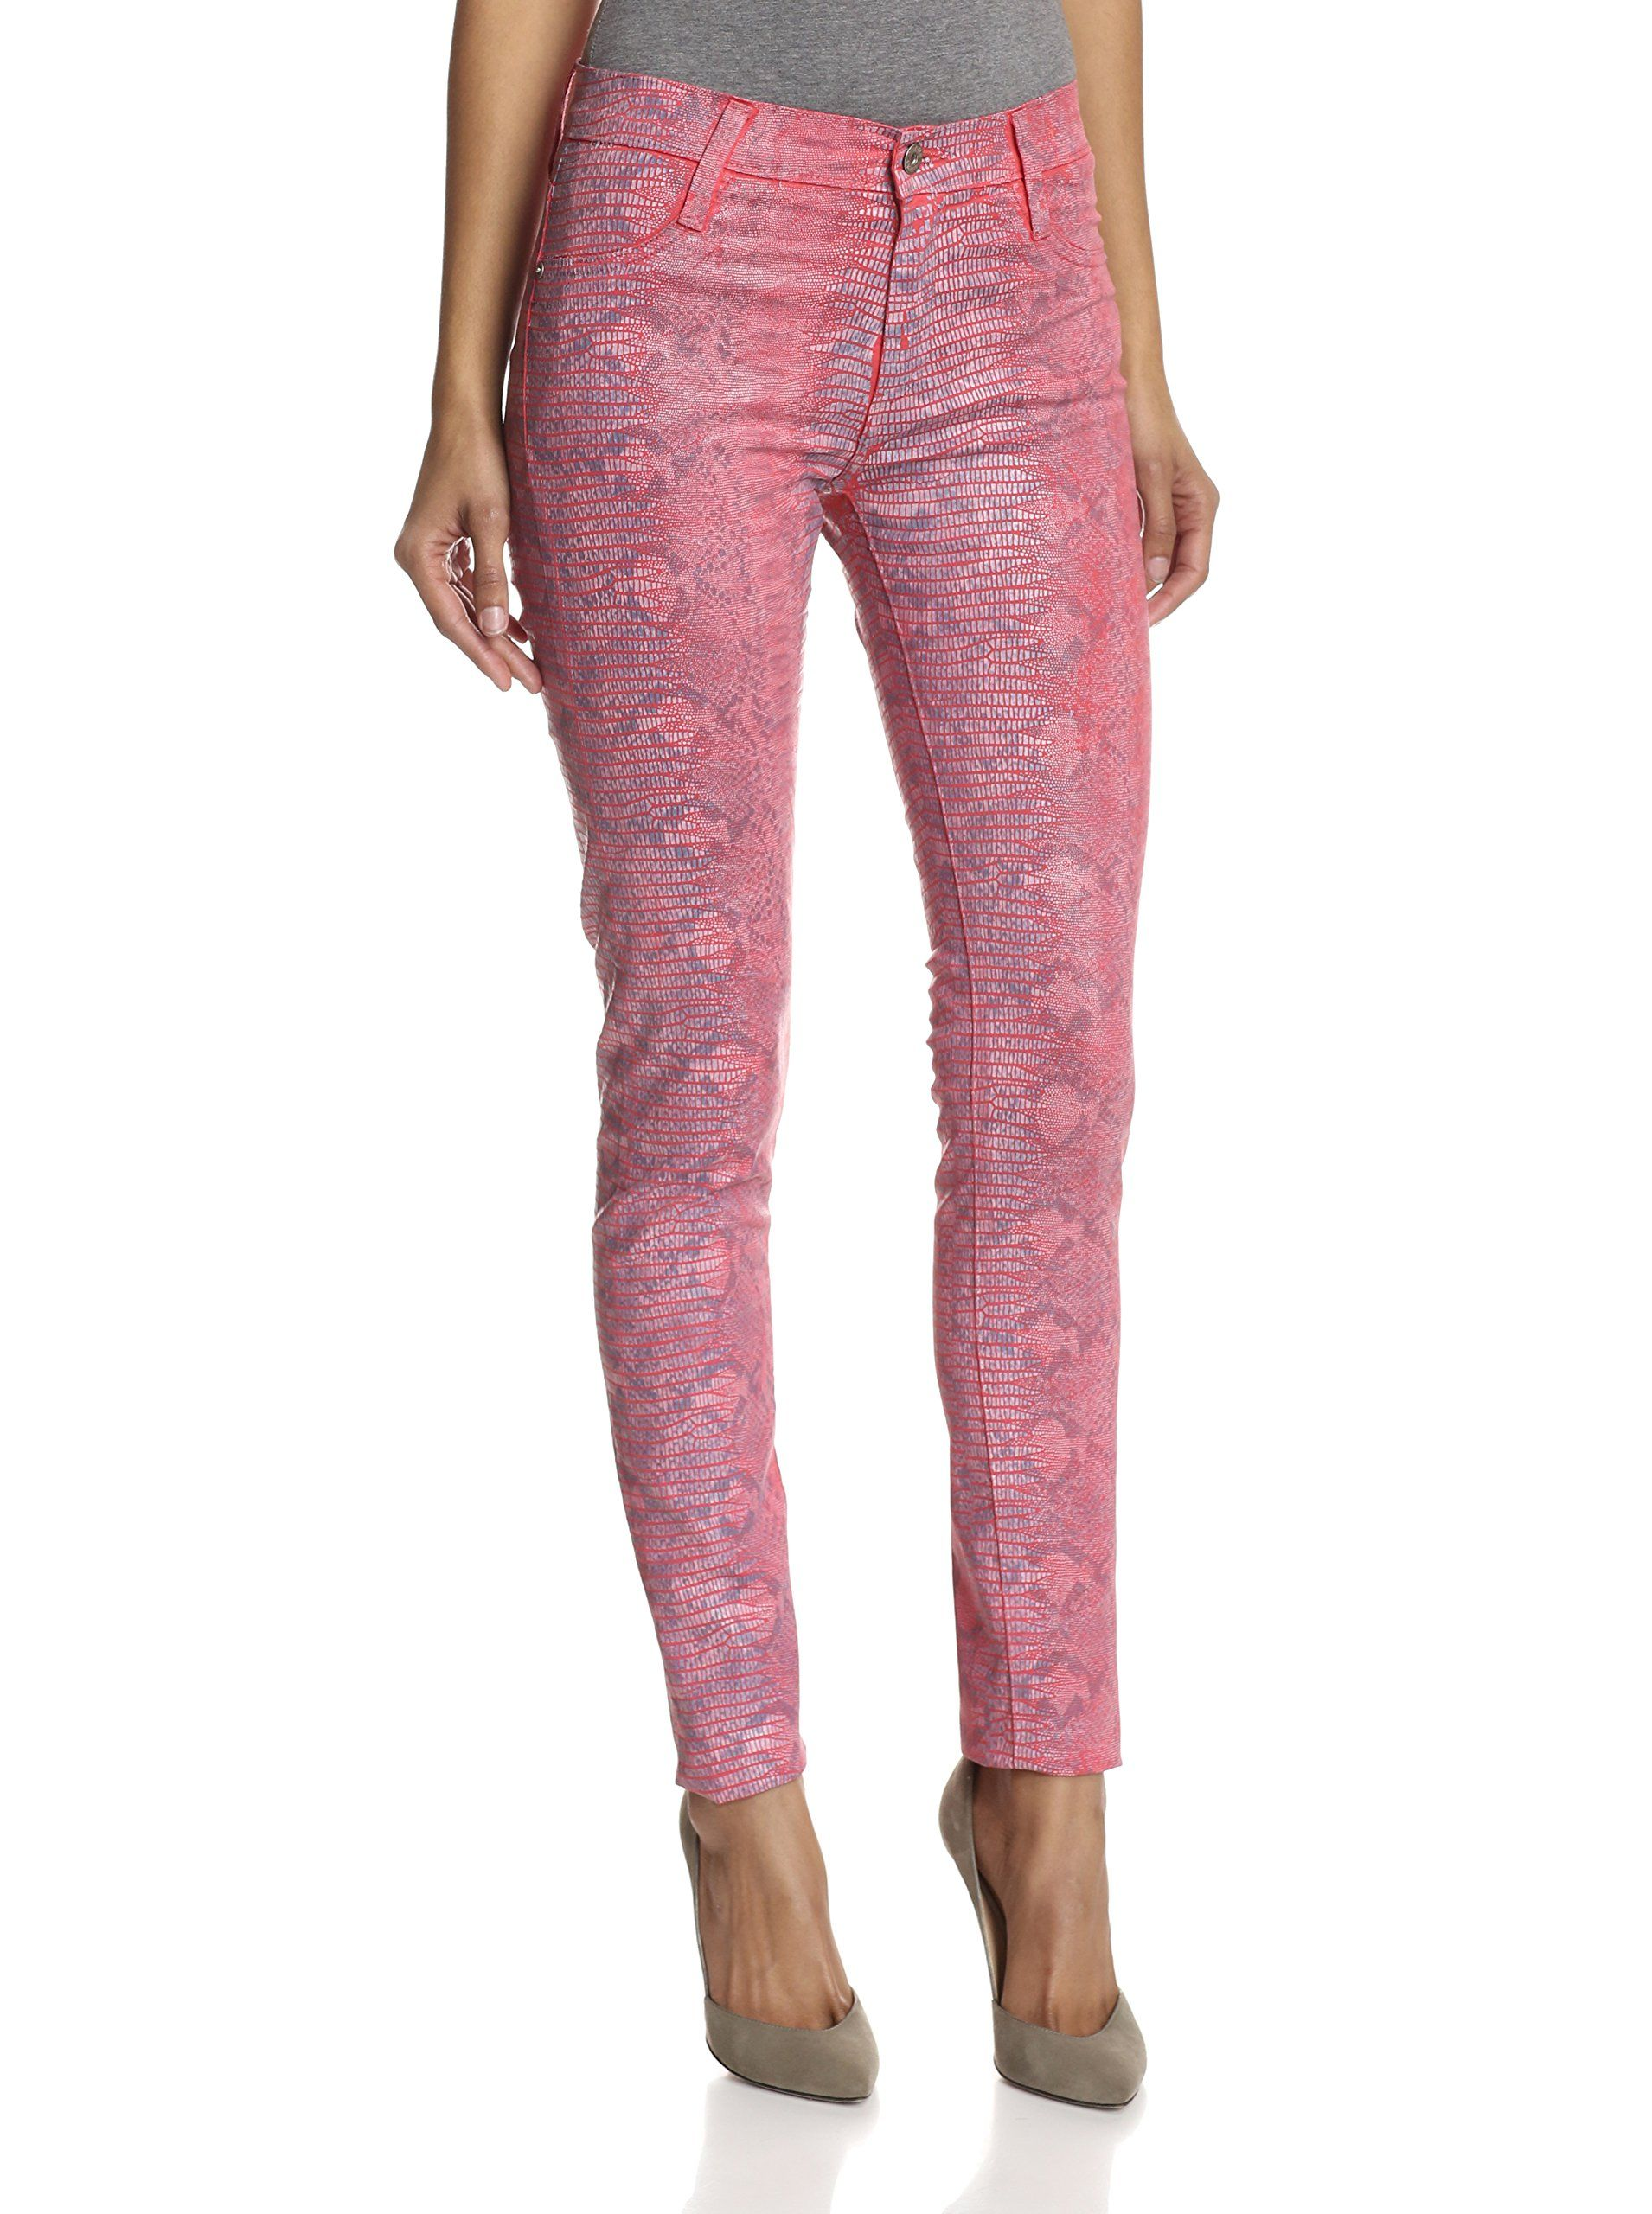 James jeans womenus twiggy legging jean at myhabit sexy